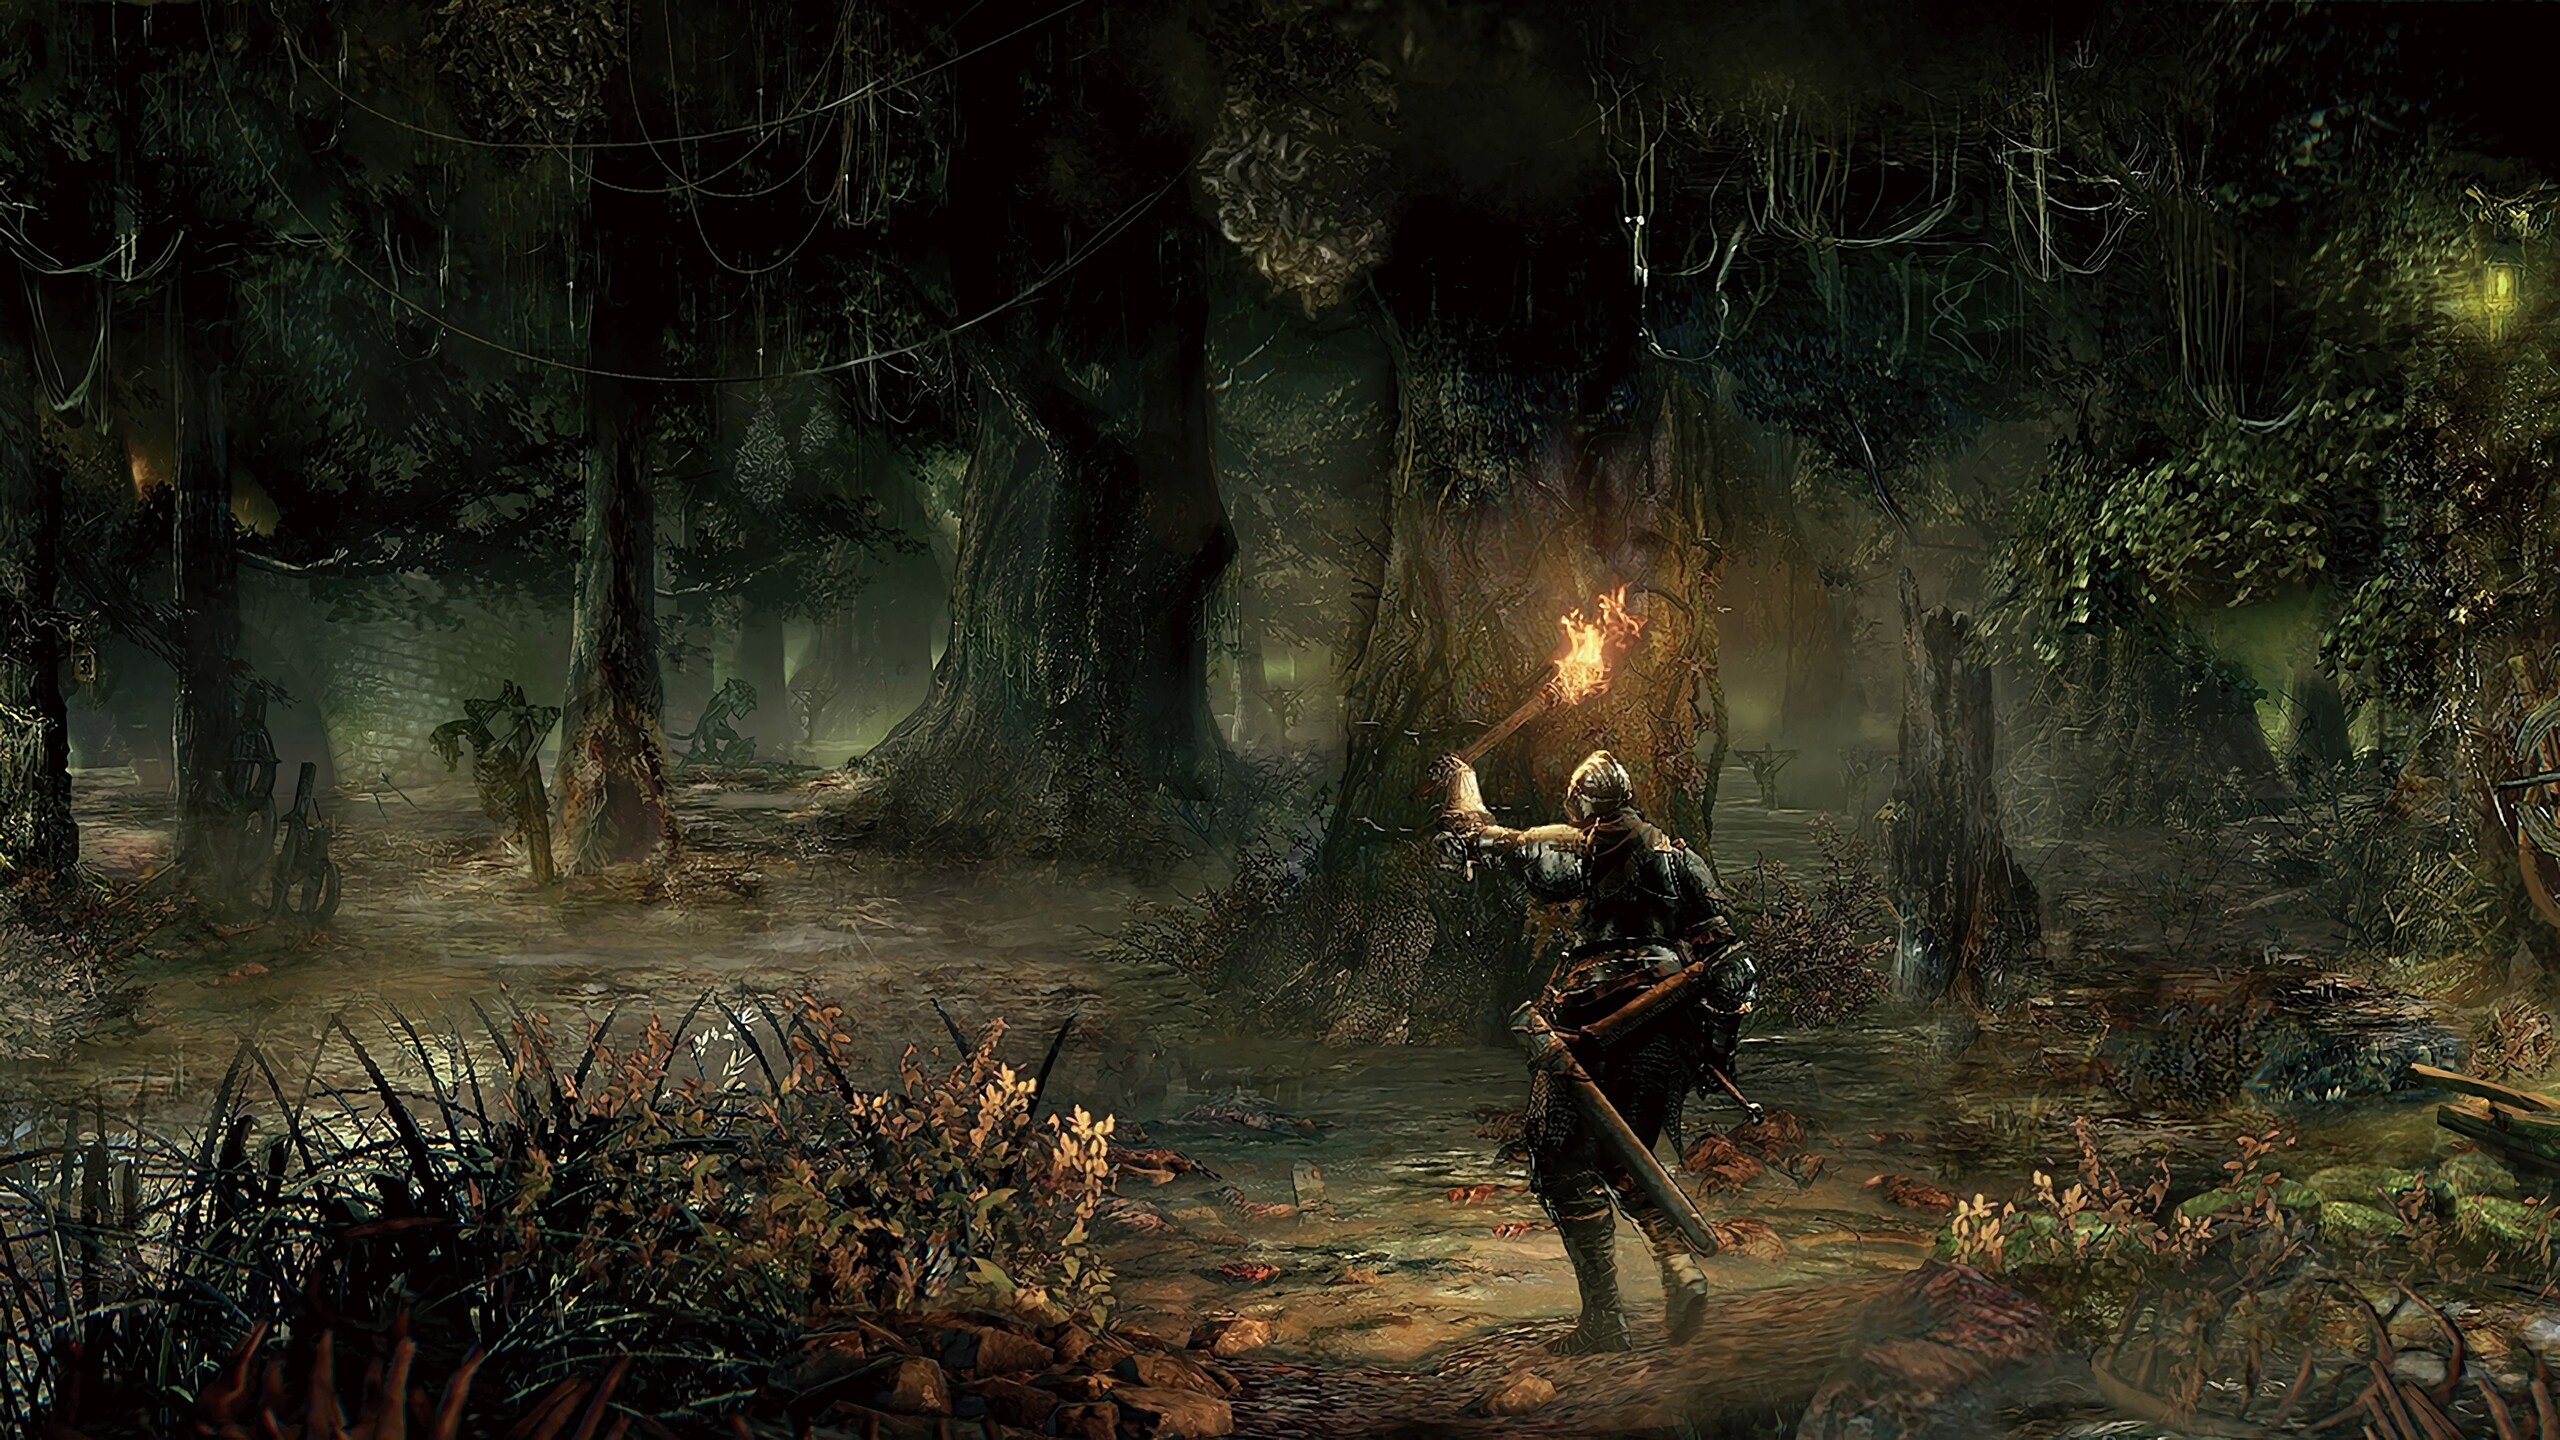 Dark Souls Wallpaper 2560x1440